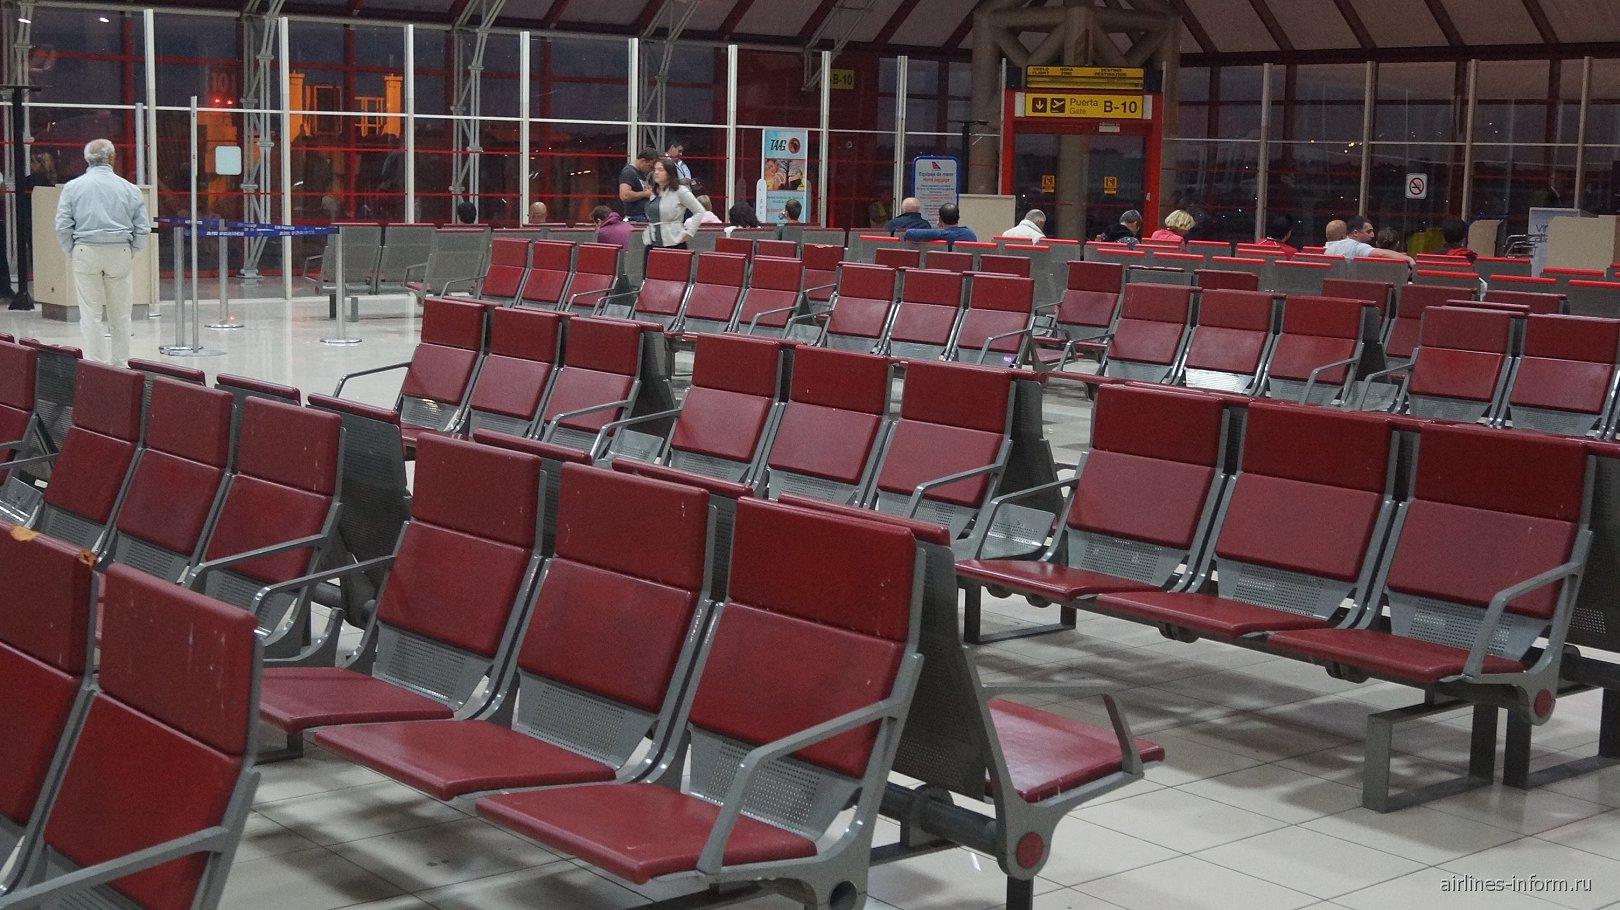 Зал ожидания в чистой зоне аэропорта Гавана Хосе Марти